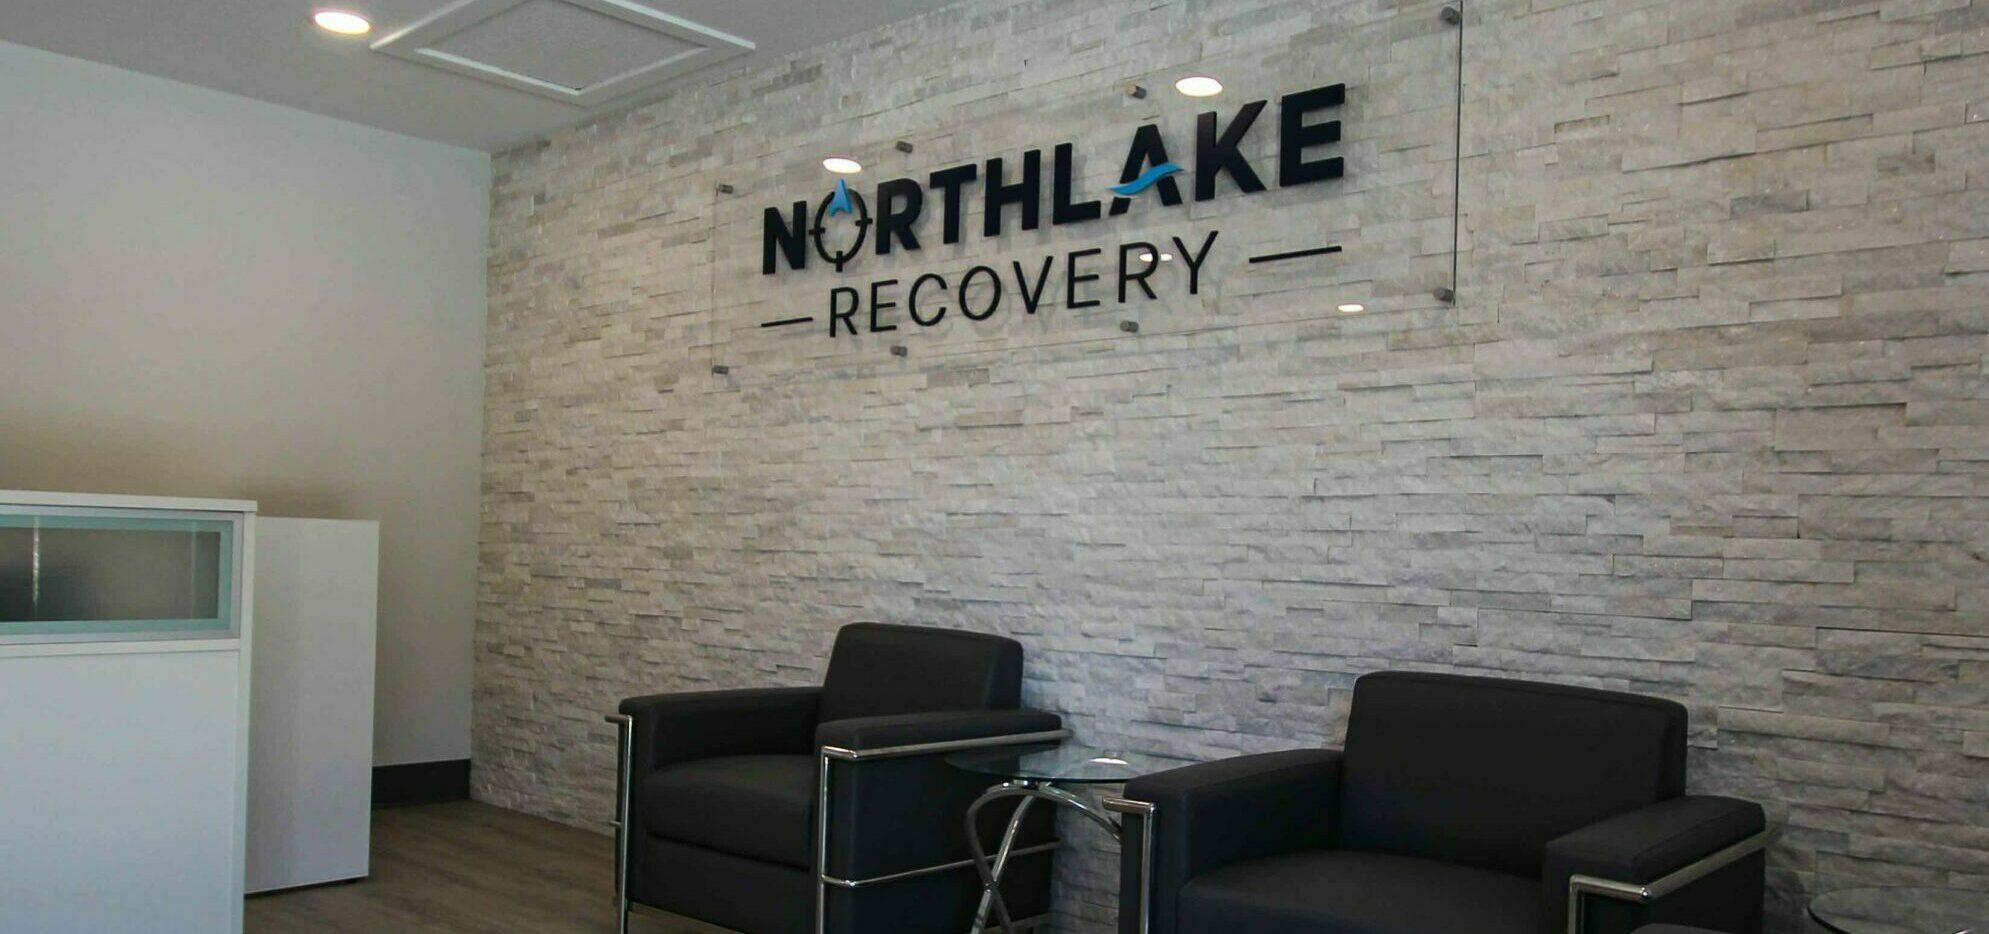 Northlake Recovery